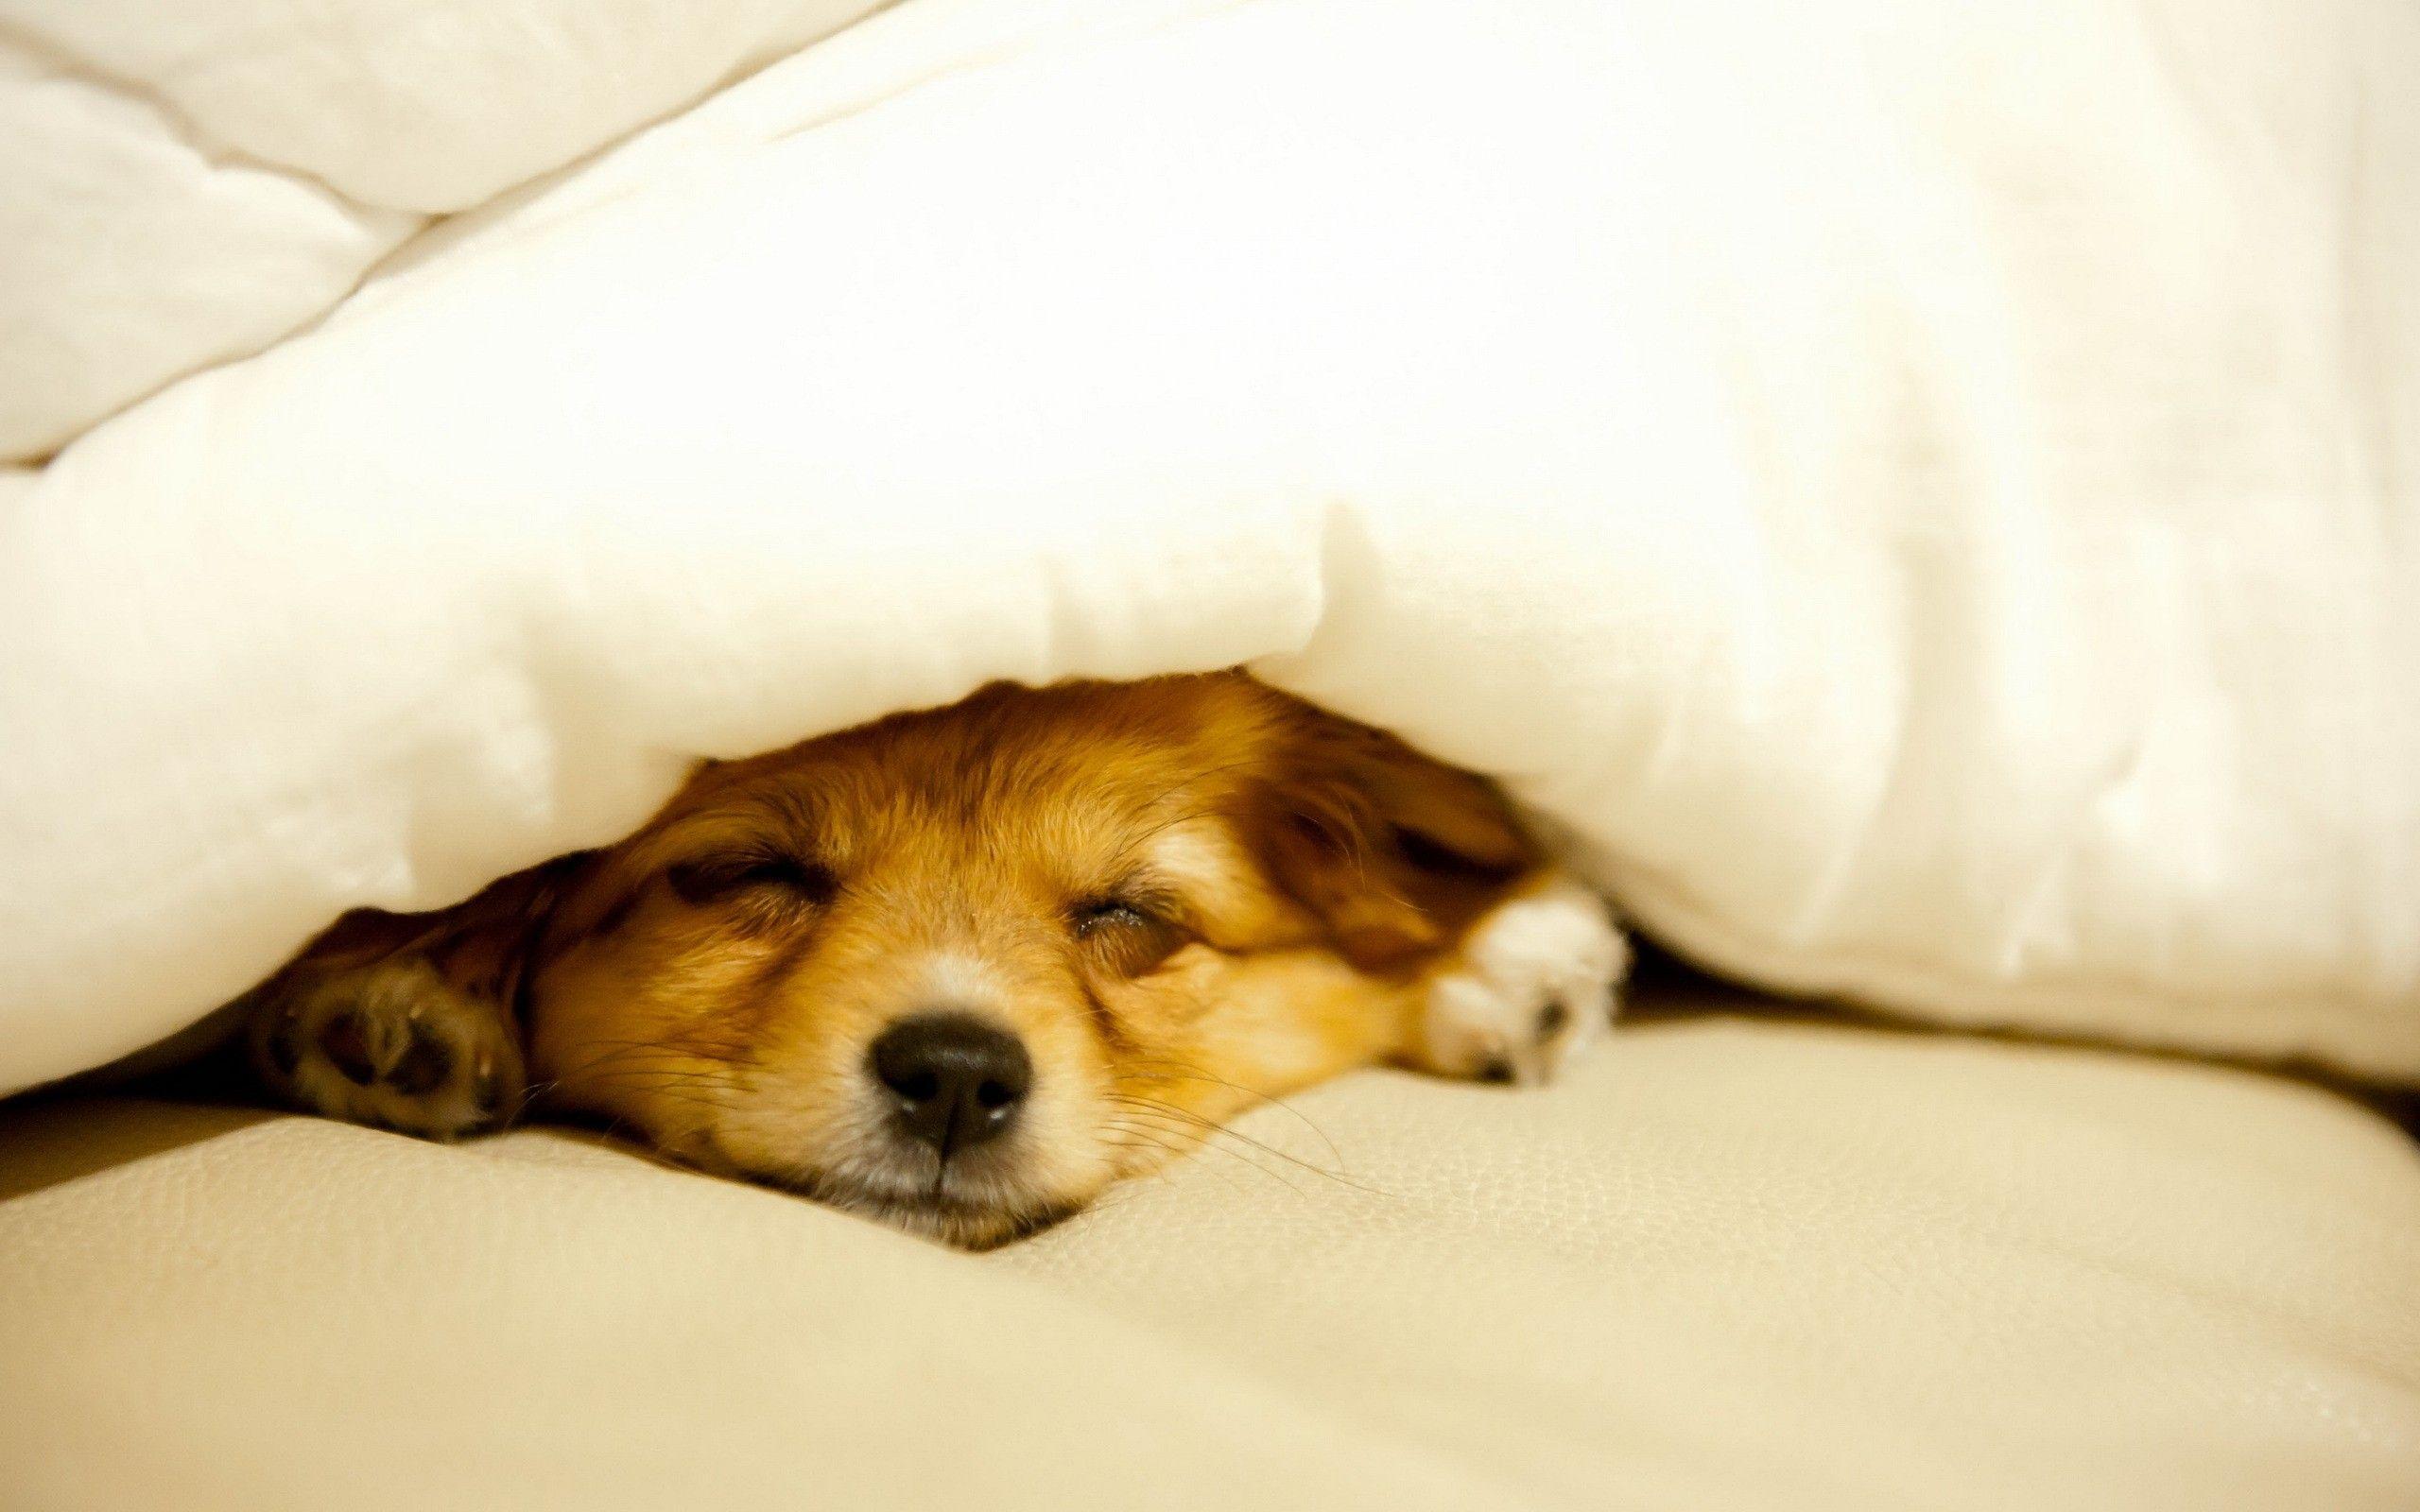 Cute Sleeping Dog Sleeping Dogs Puppies Puppy Blanket